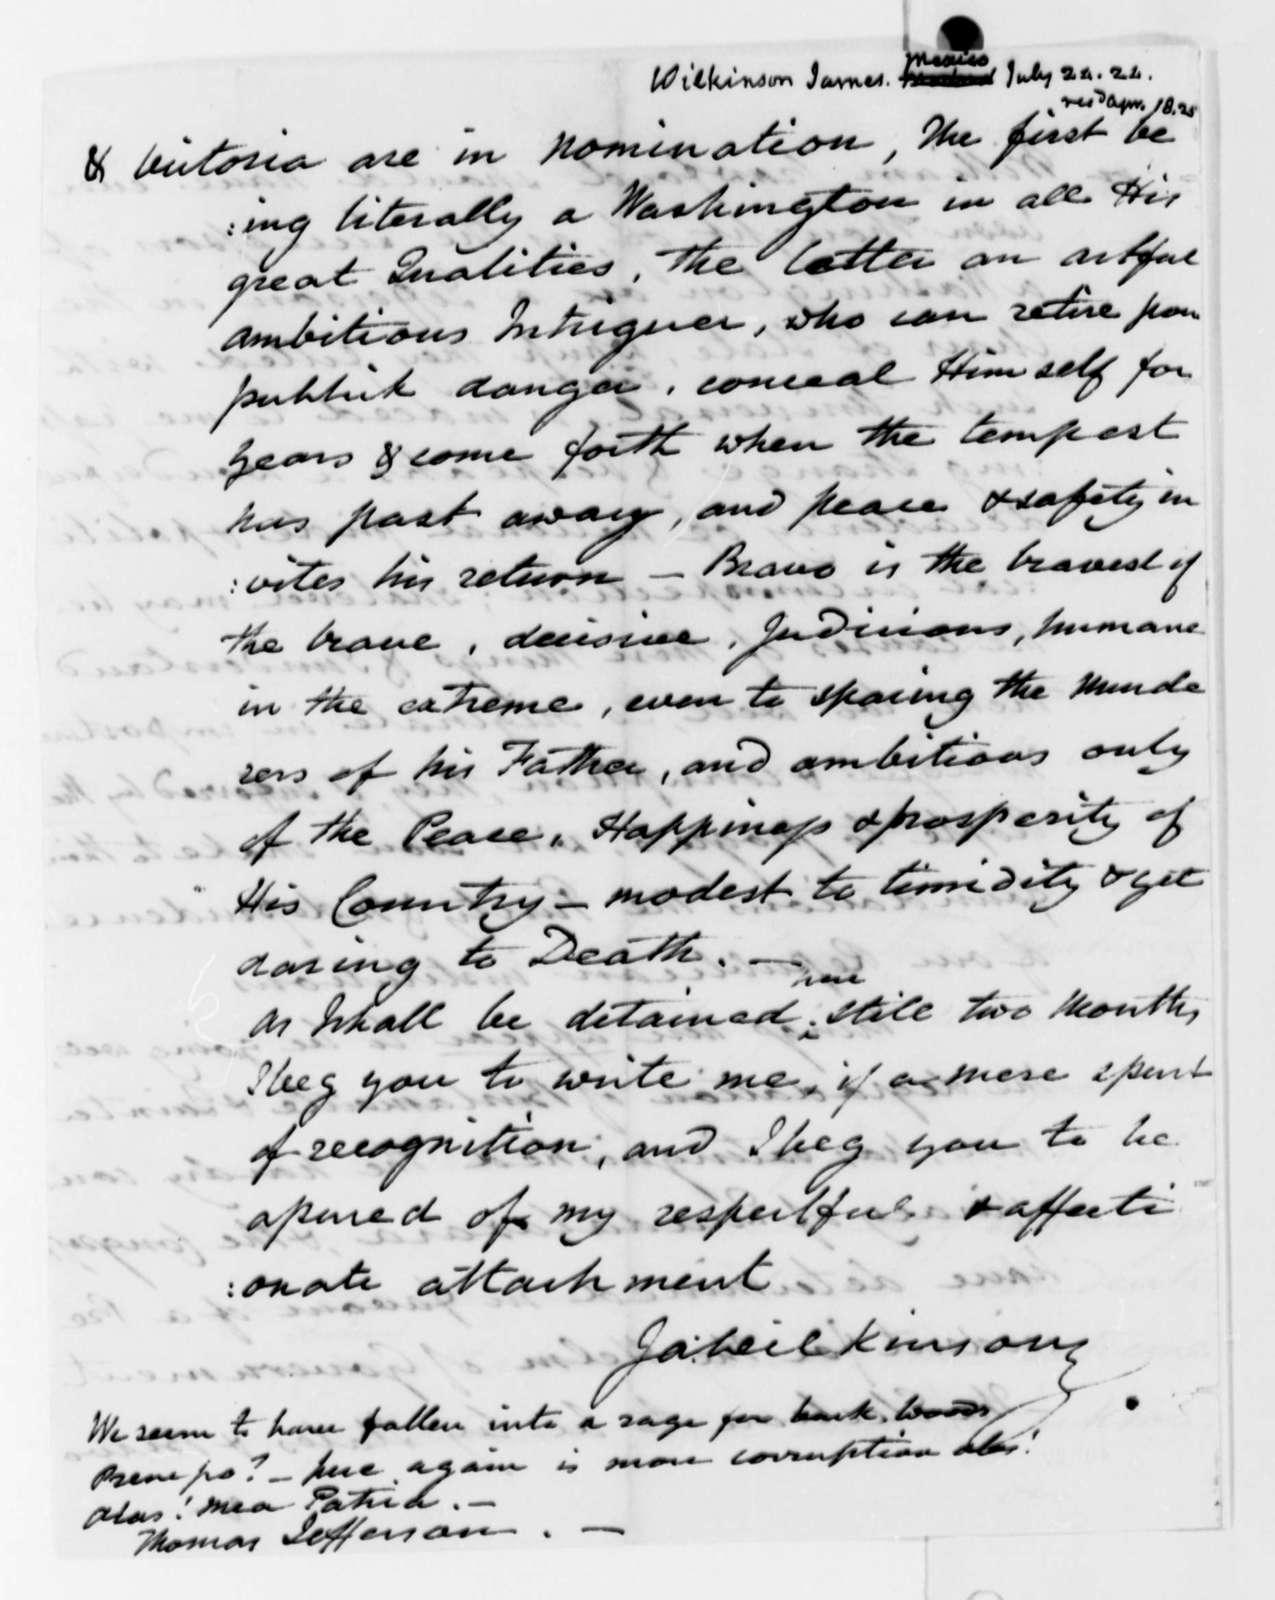 James Wilkinson to Thomas Jefferson, July 20, 1824